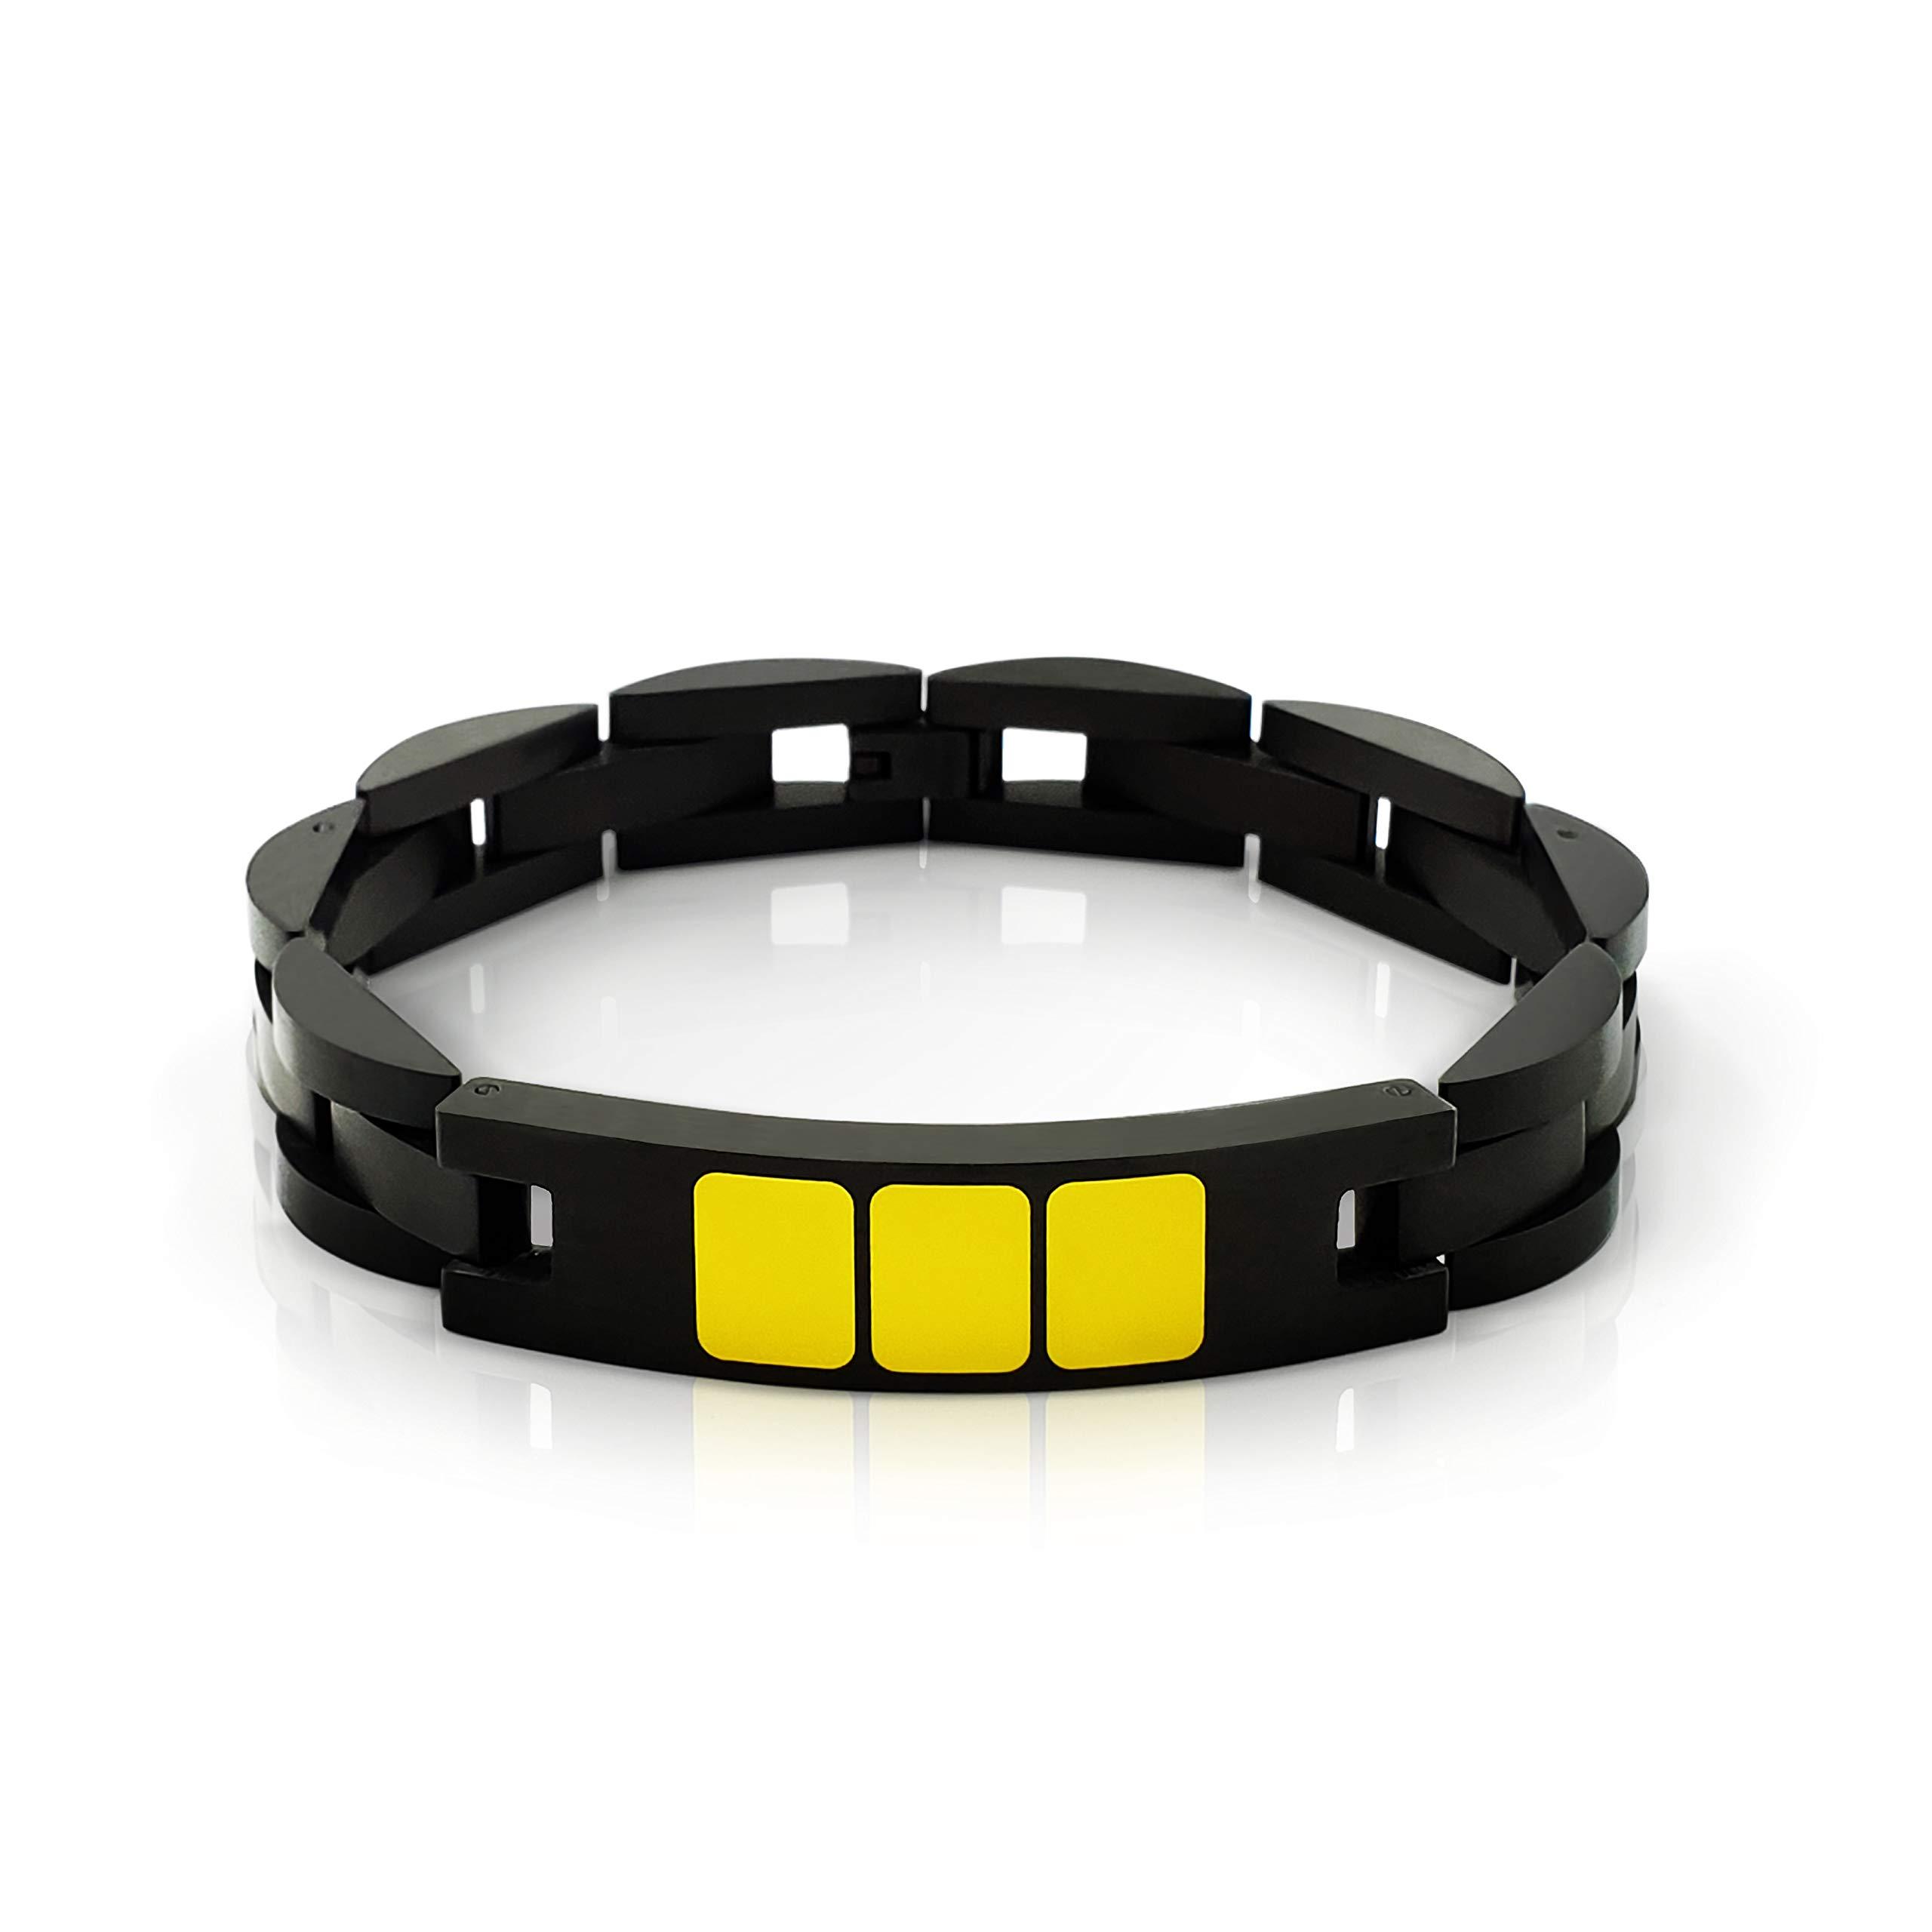 Aviation Pilot Bracelet – Perfect Pilot Gift - Black Matte Stainless Steel - Handmade Paint – Water/Dustproof - Adjustable Size Jewelry - Gift Ready Package